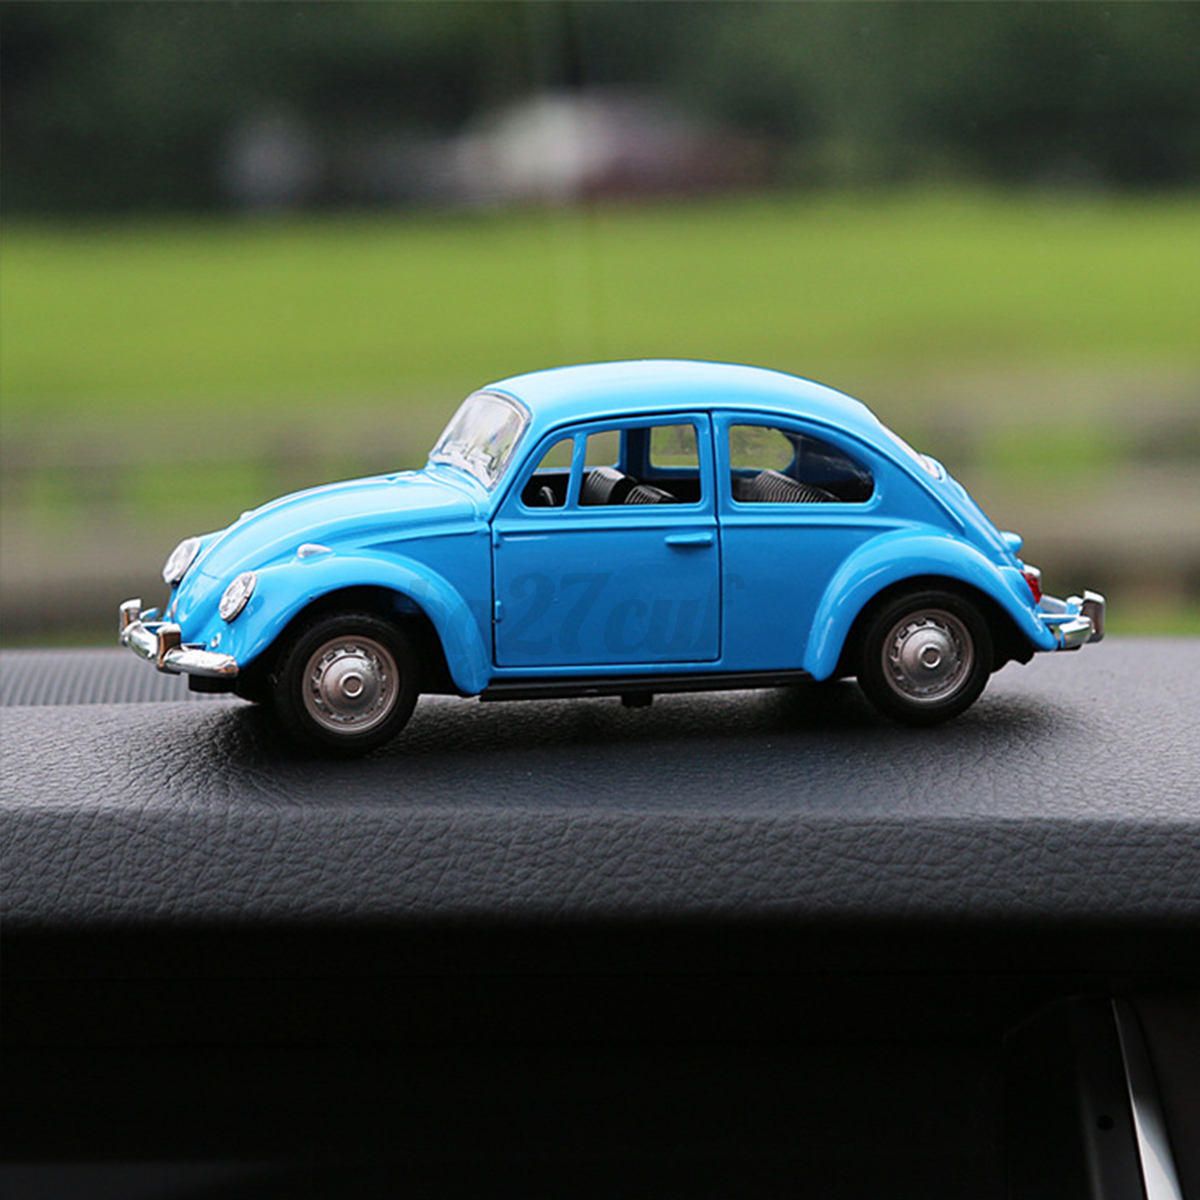 1-32-For-Volkswagen-Beetle-Diecast-Model-Pull-Back-Car-Toy-Gift-Children-Decor